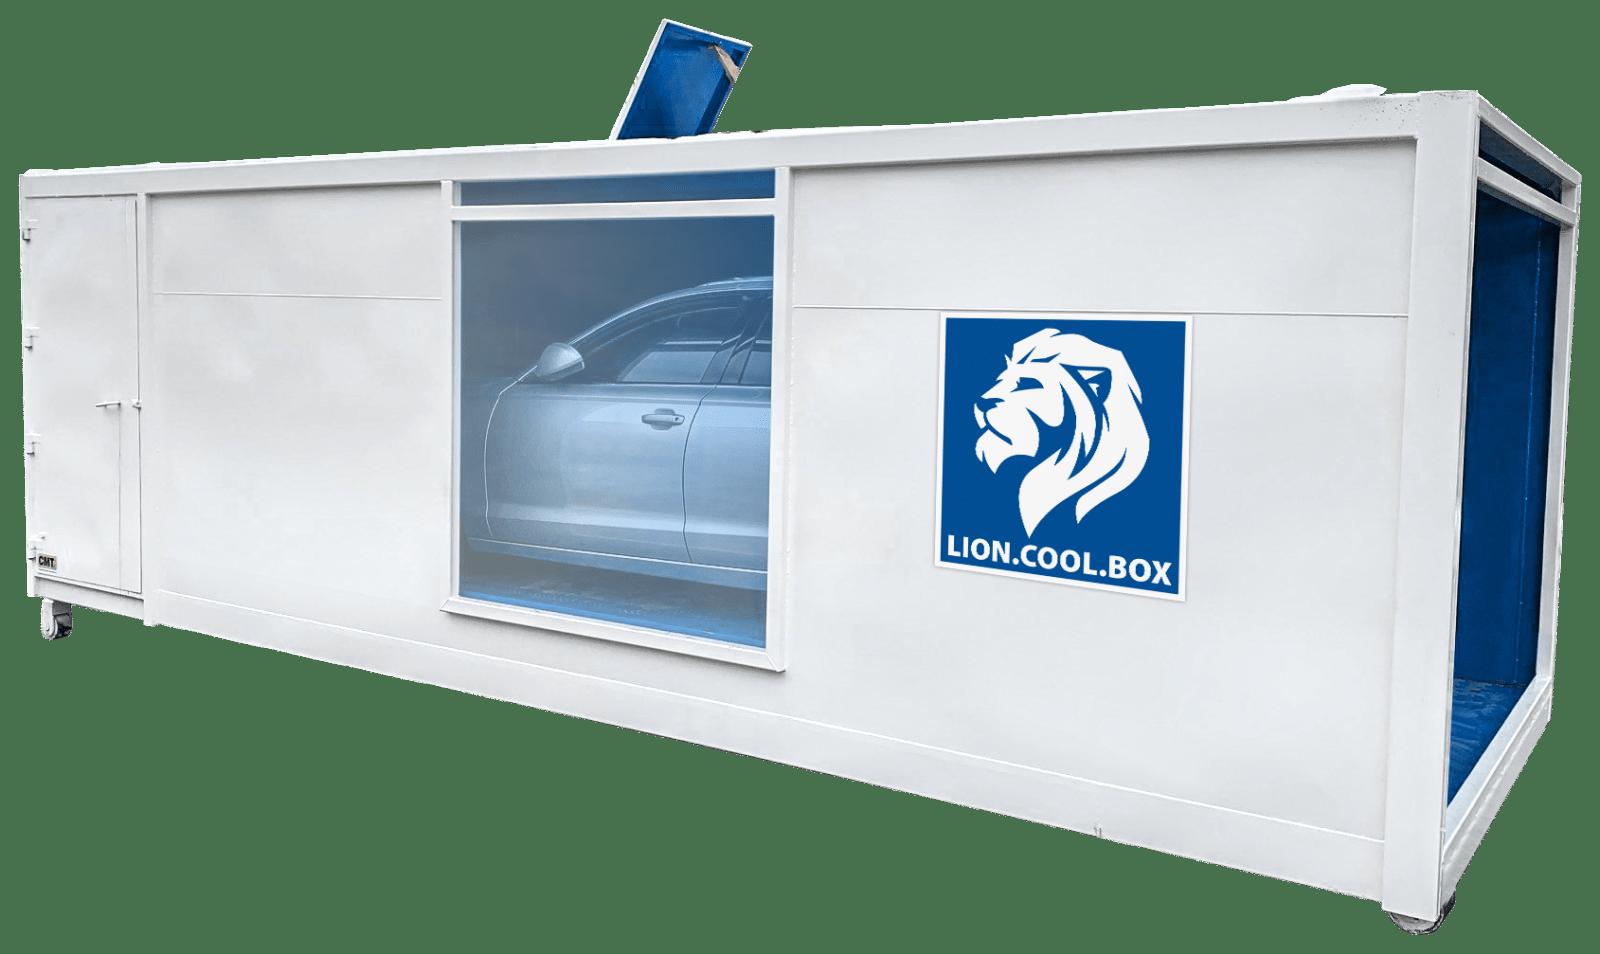 lion-cool-box-product-image